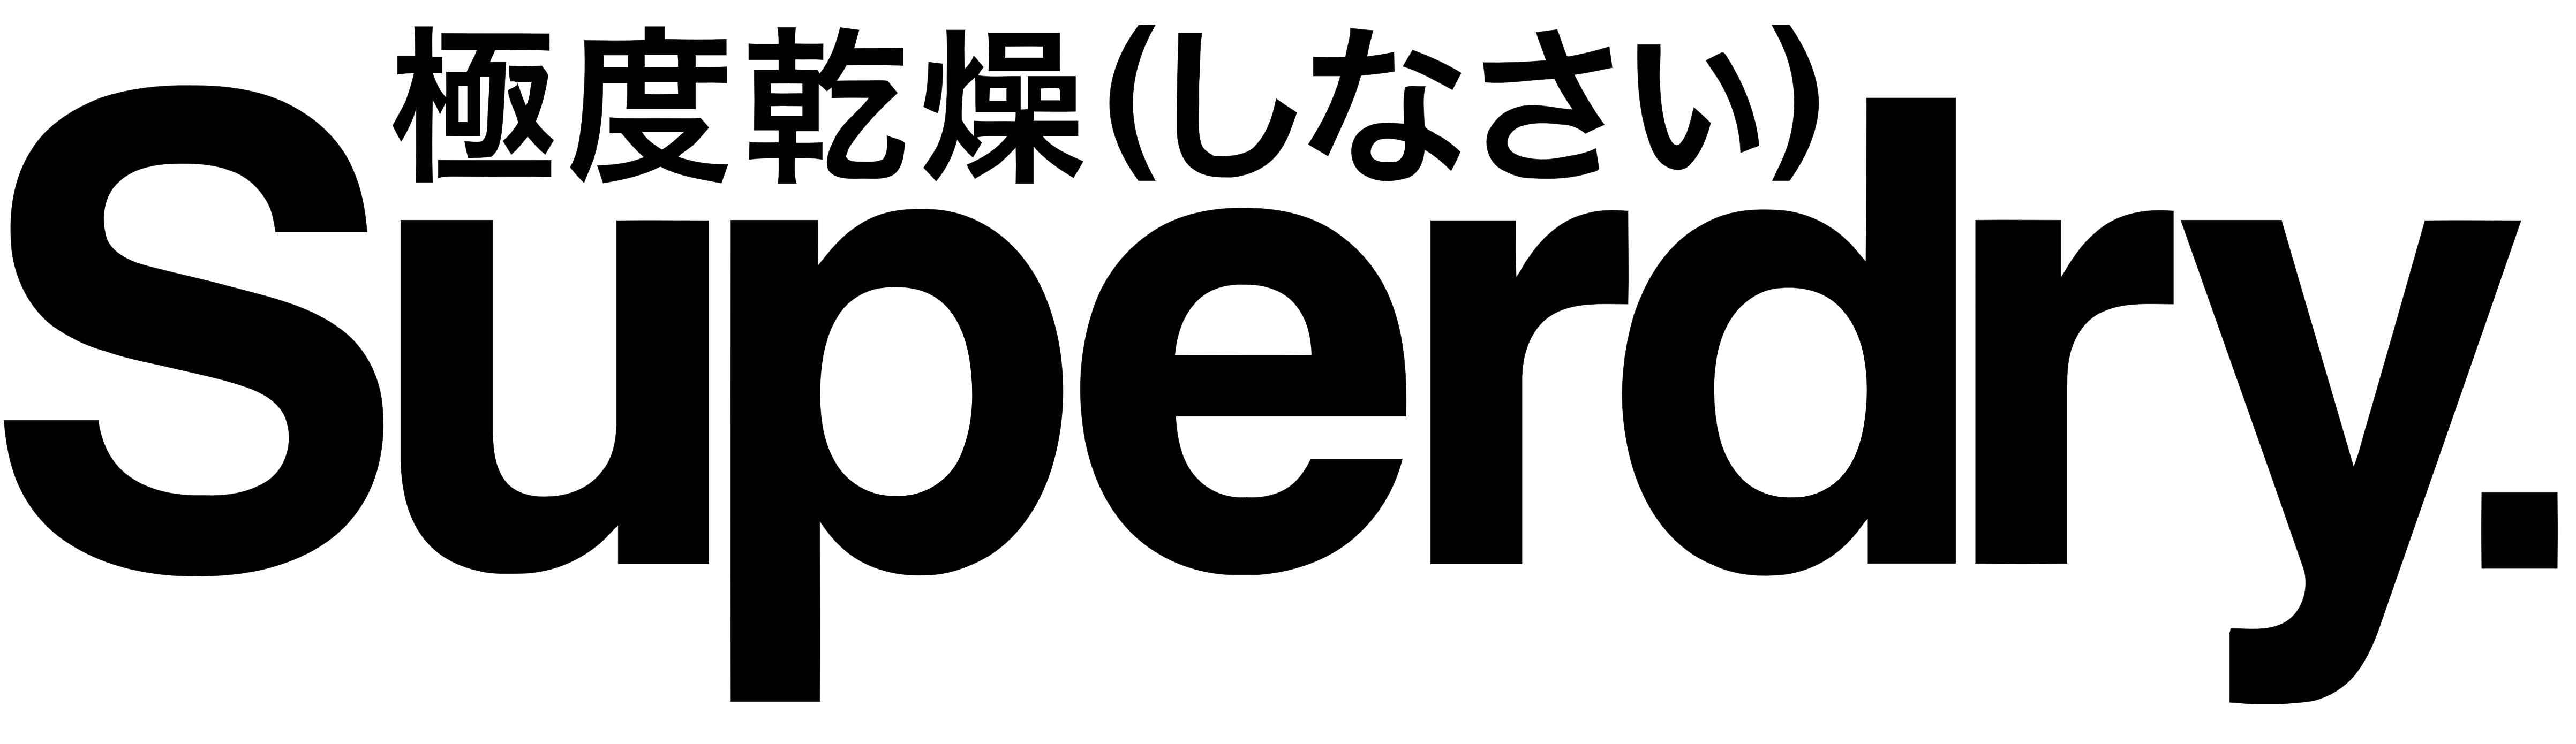 Superdry affiliate logo